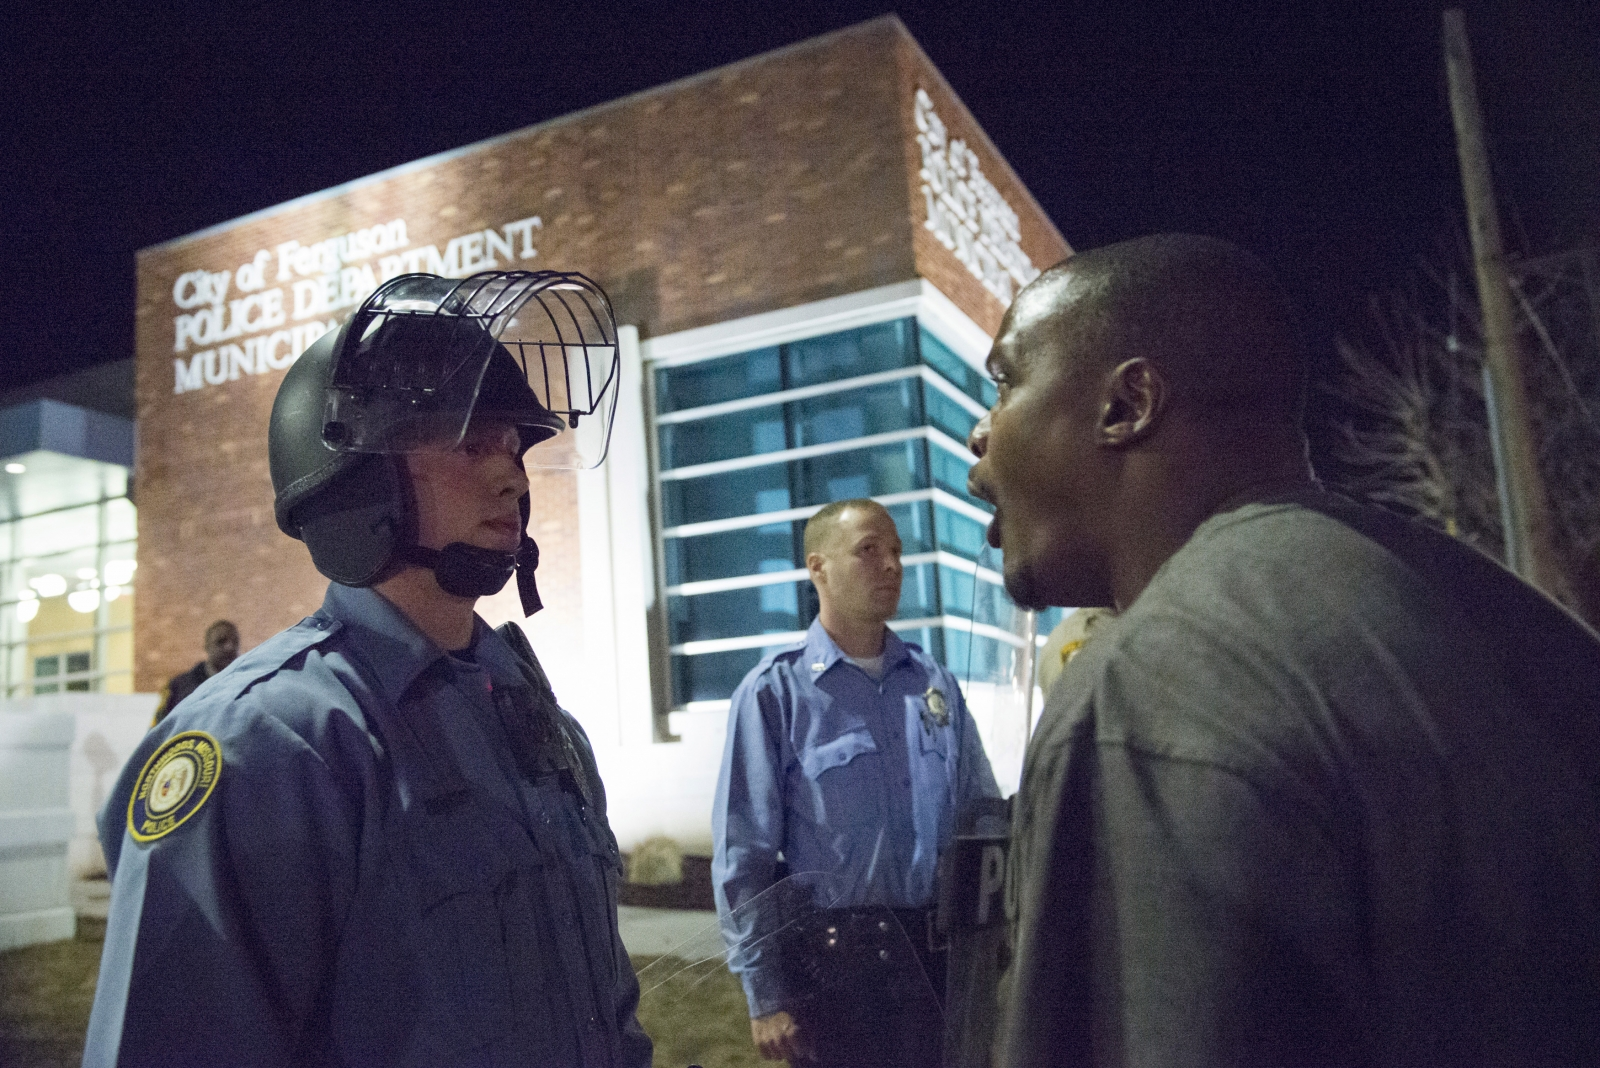 Civil unrest in Ferguson erupts into violence